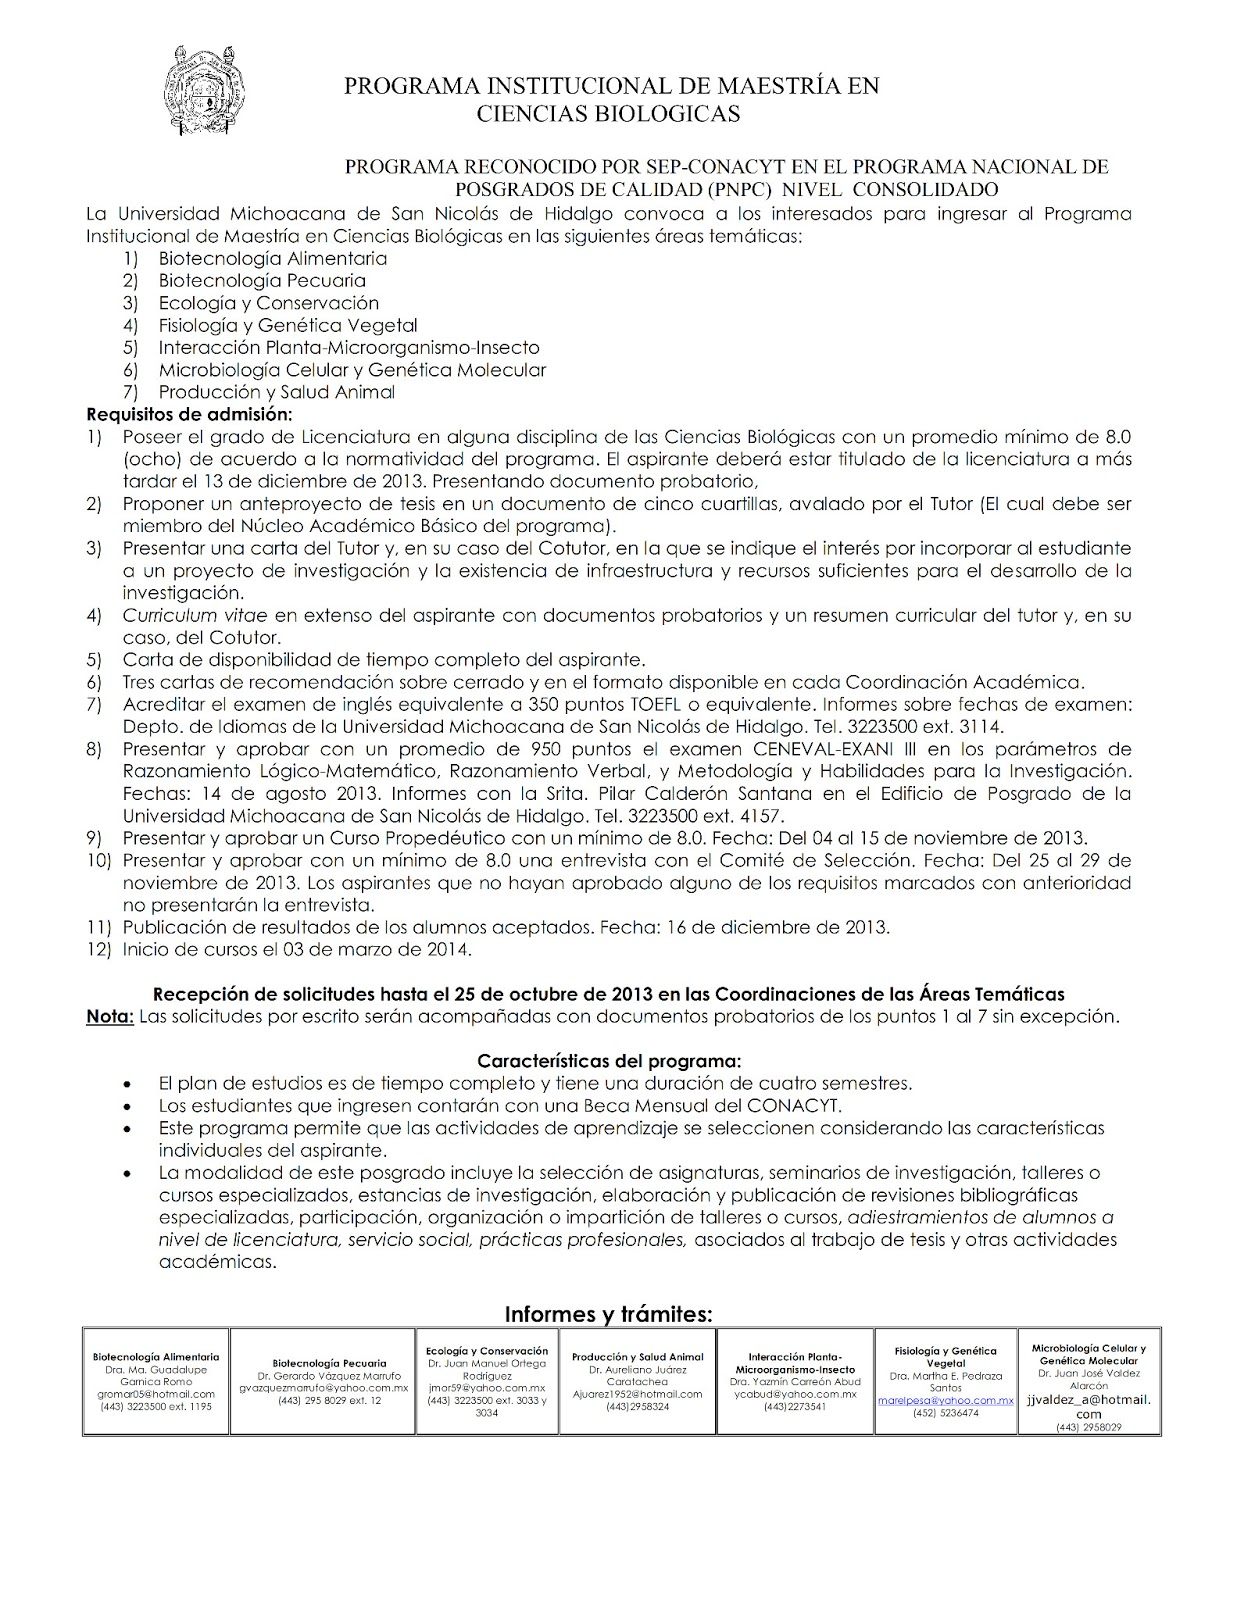 CONVOCATORIA 2013 PROGRAMA INSTITUCIONAL DE MAESTRIA EN CIENCIAS